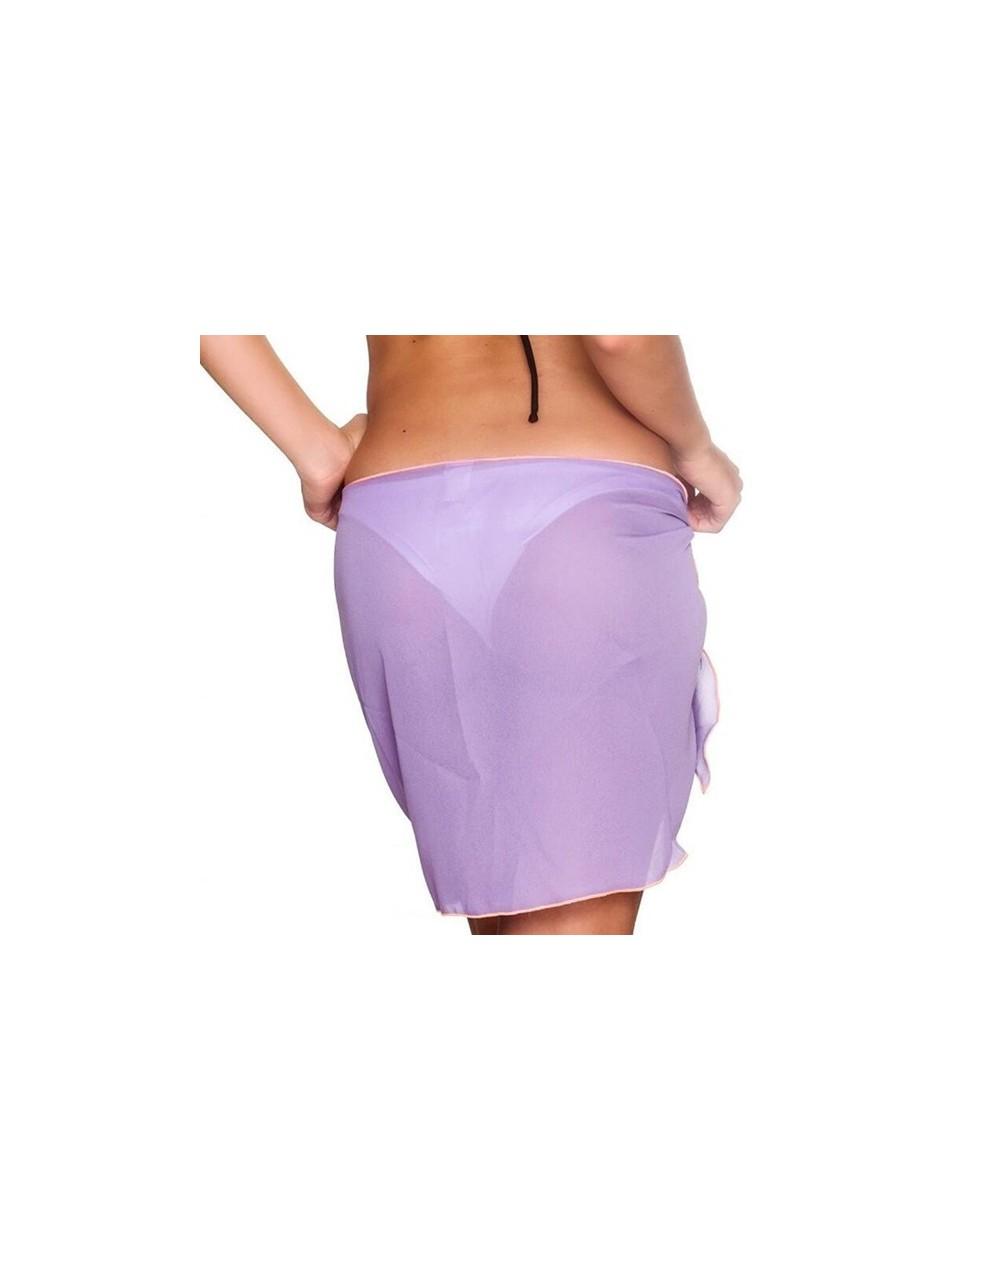 Summer Chiffon Cover Up Sarong Skirts Transparent See Through Night Club Skirt Beach Wear Low Waist Asymmetrical Skirts - D1...